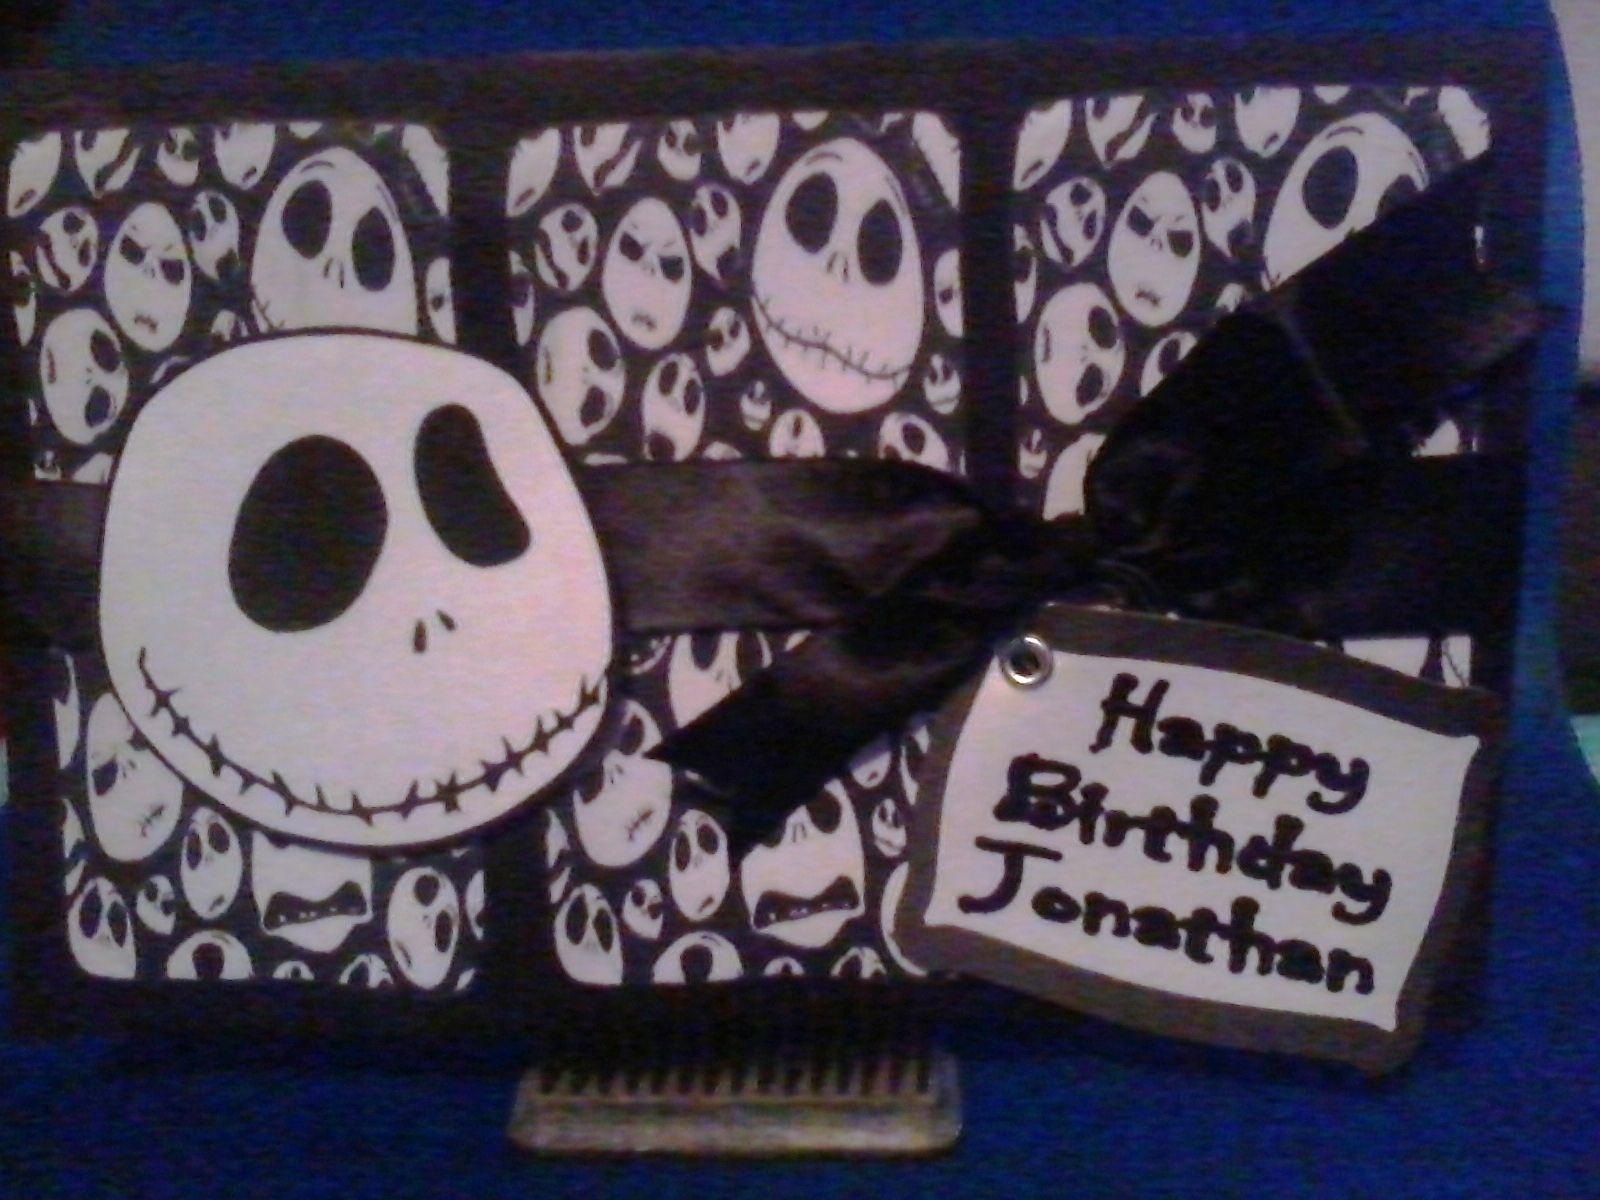 Stupendous Nightmare Before Christmas Birthday Card Crafty Son Of A Funny Birthday Cards Online Ioscodamsfinfo